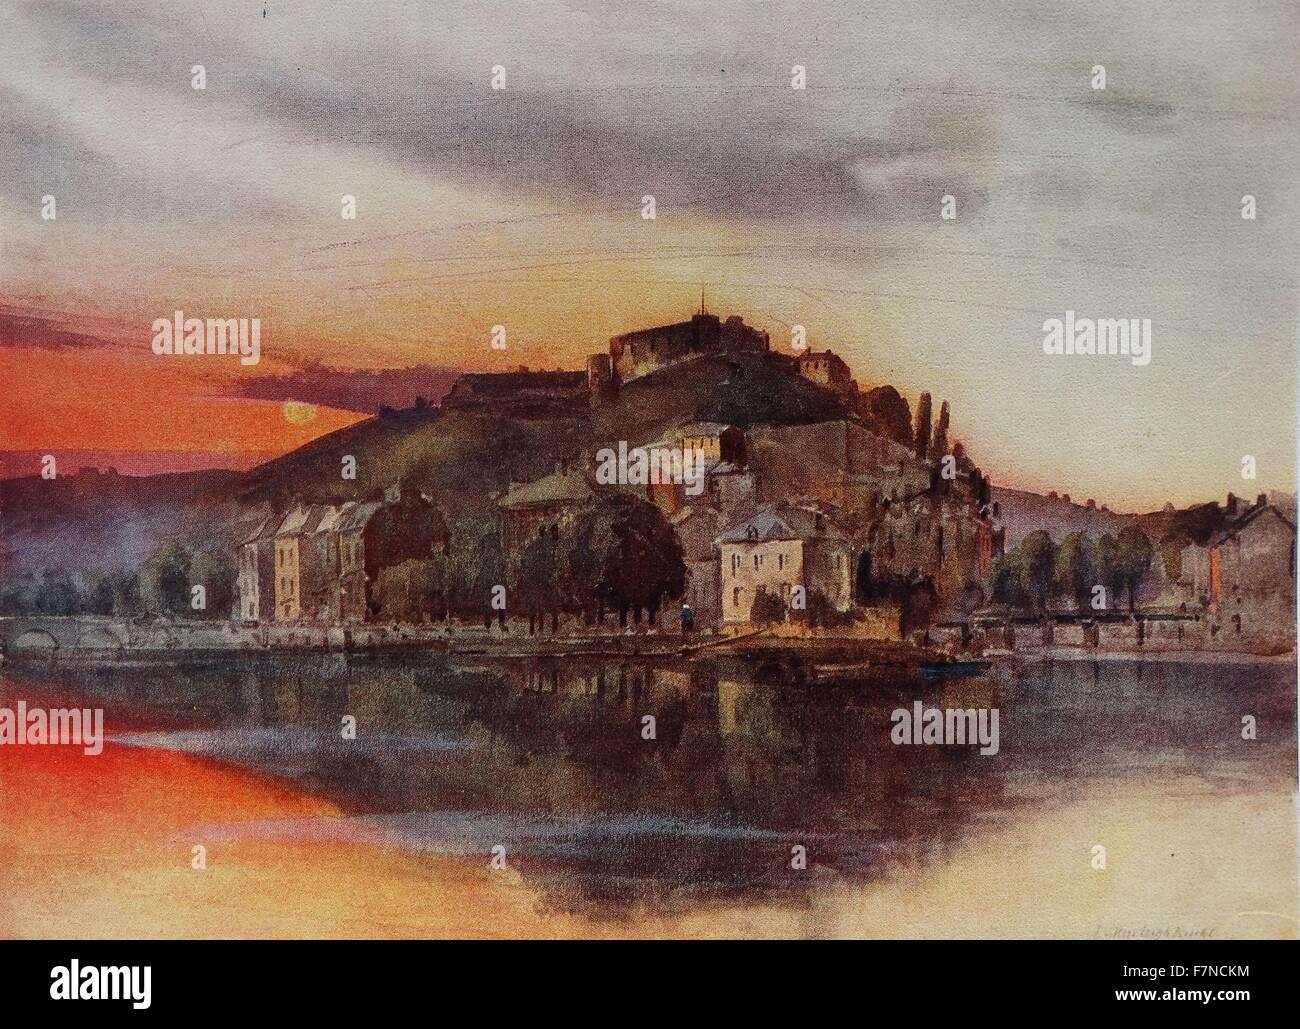 View of Namur and its citadel; Belgium 1914 - Stock Image